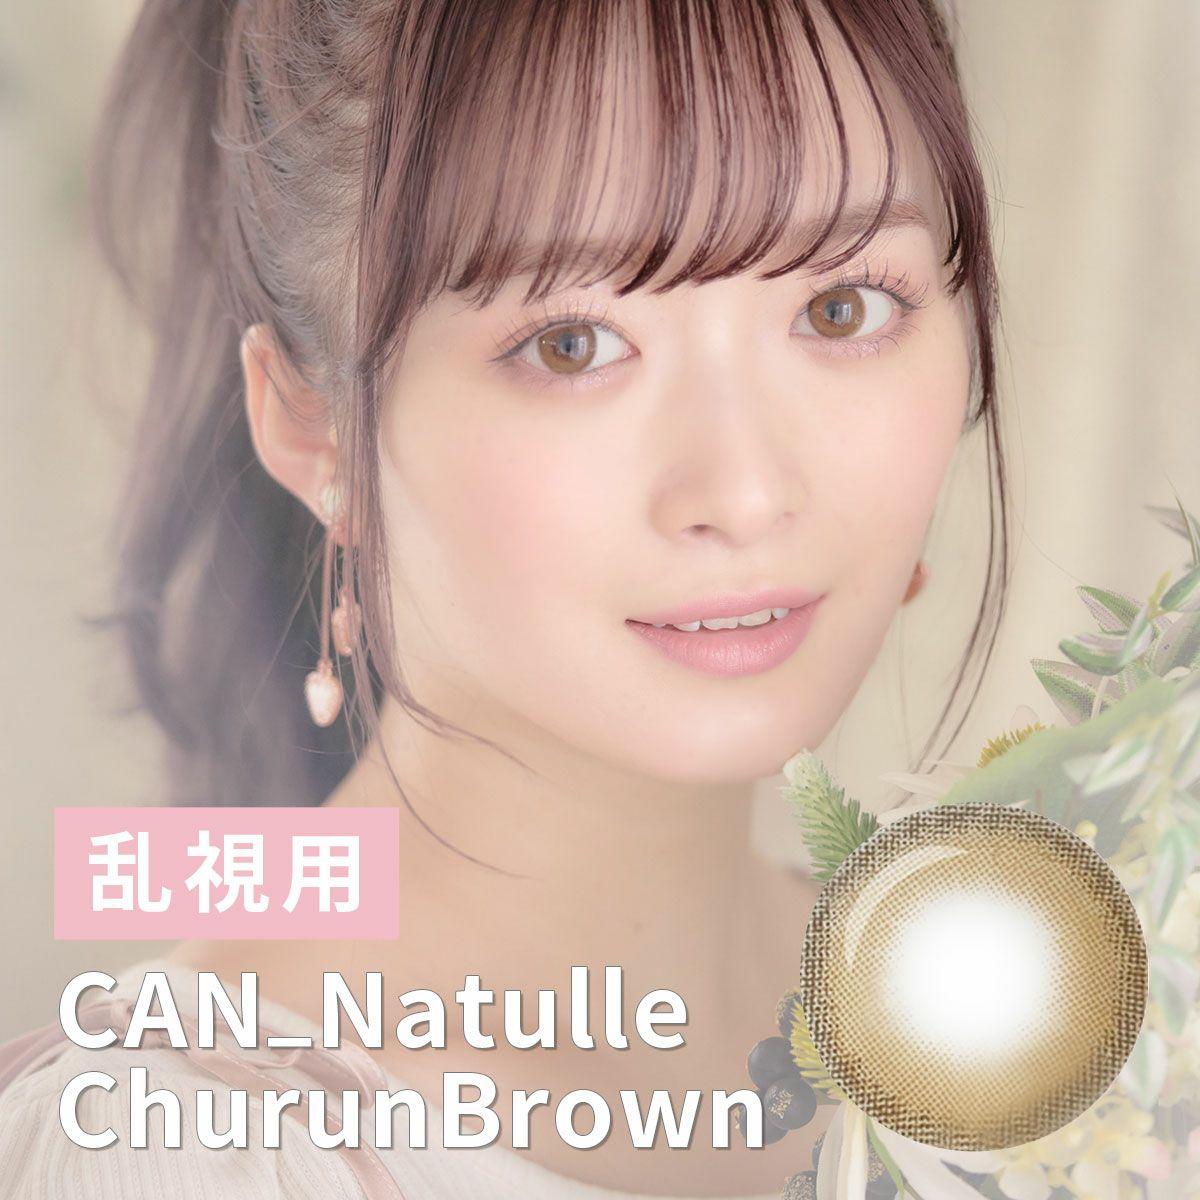 乱視用 CAN_NAtulle idol beige